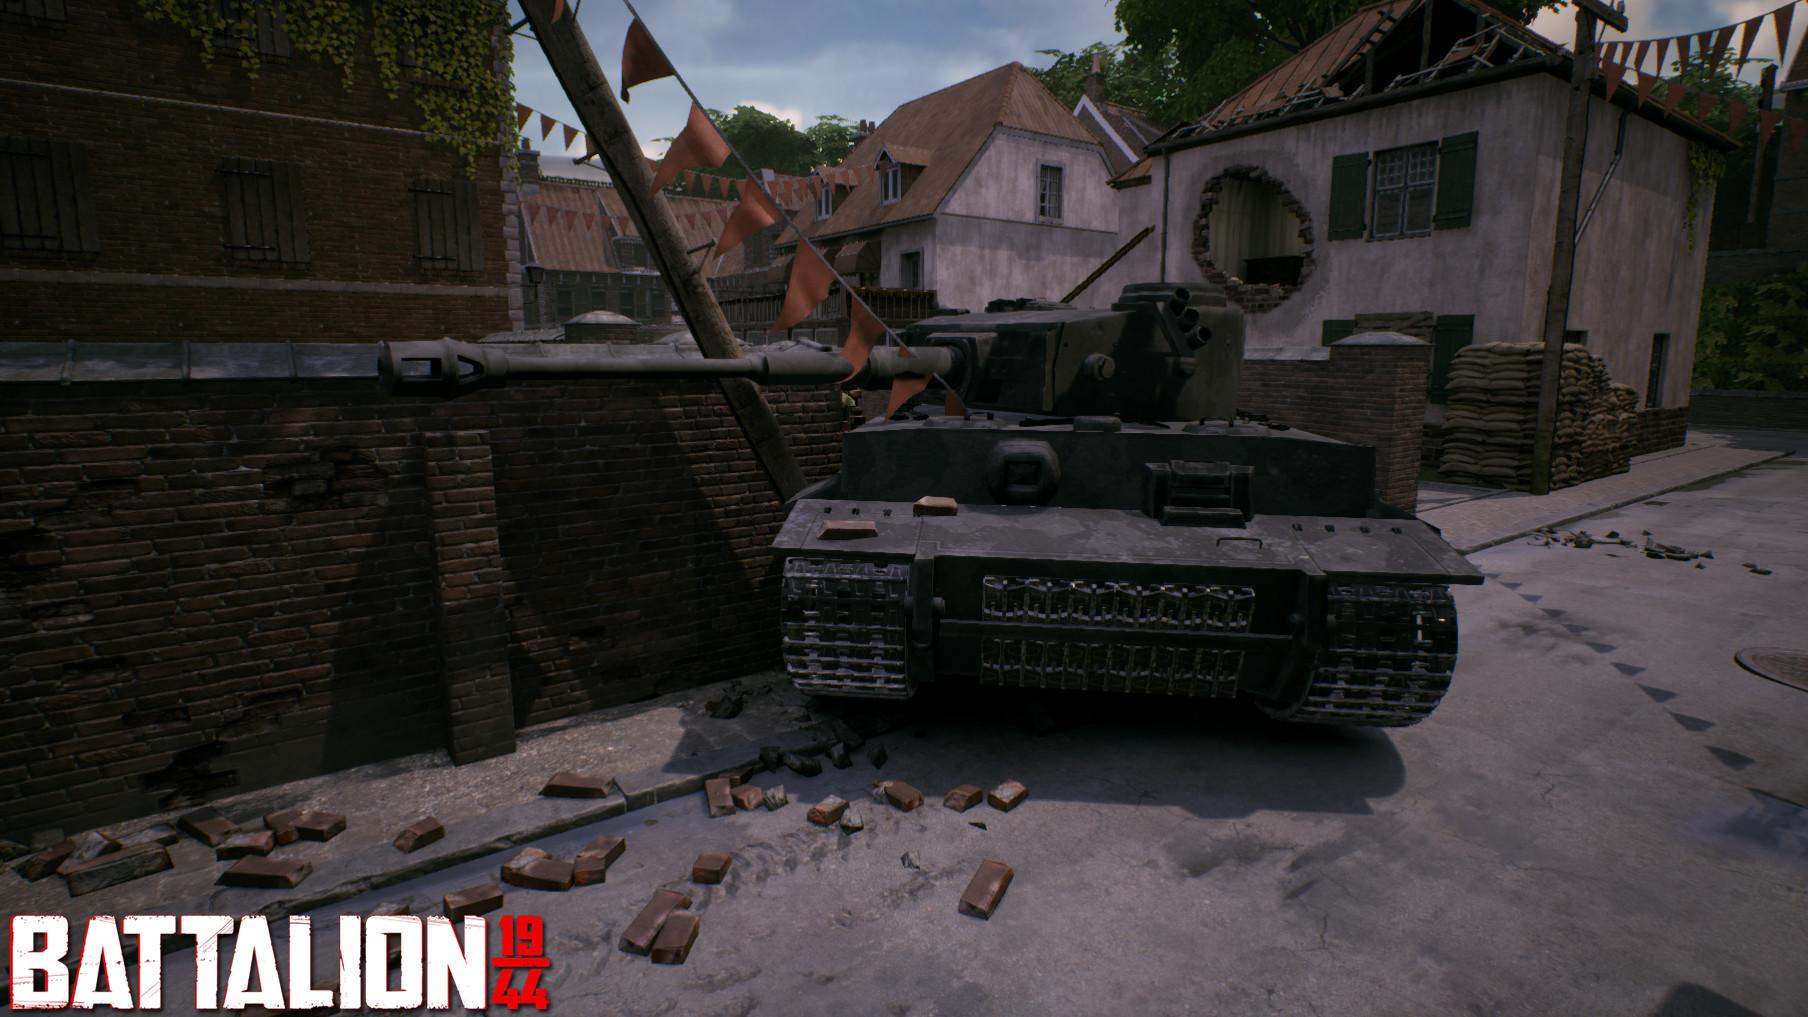 Jordan younie battalion 1944 screenshot 2018 02 25 18 55 38 94